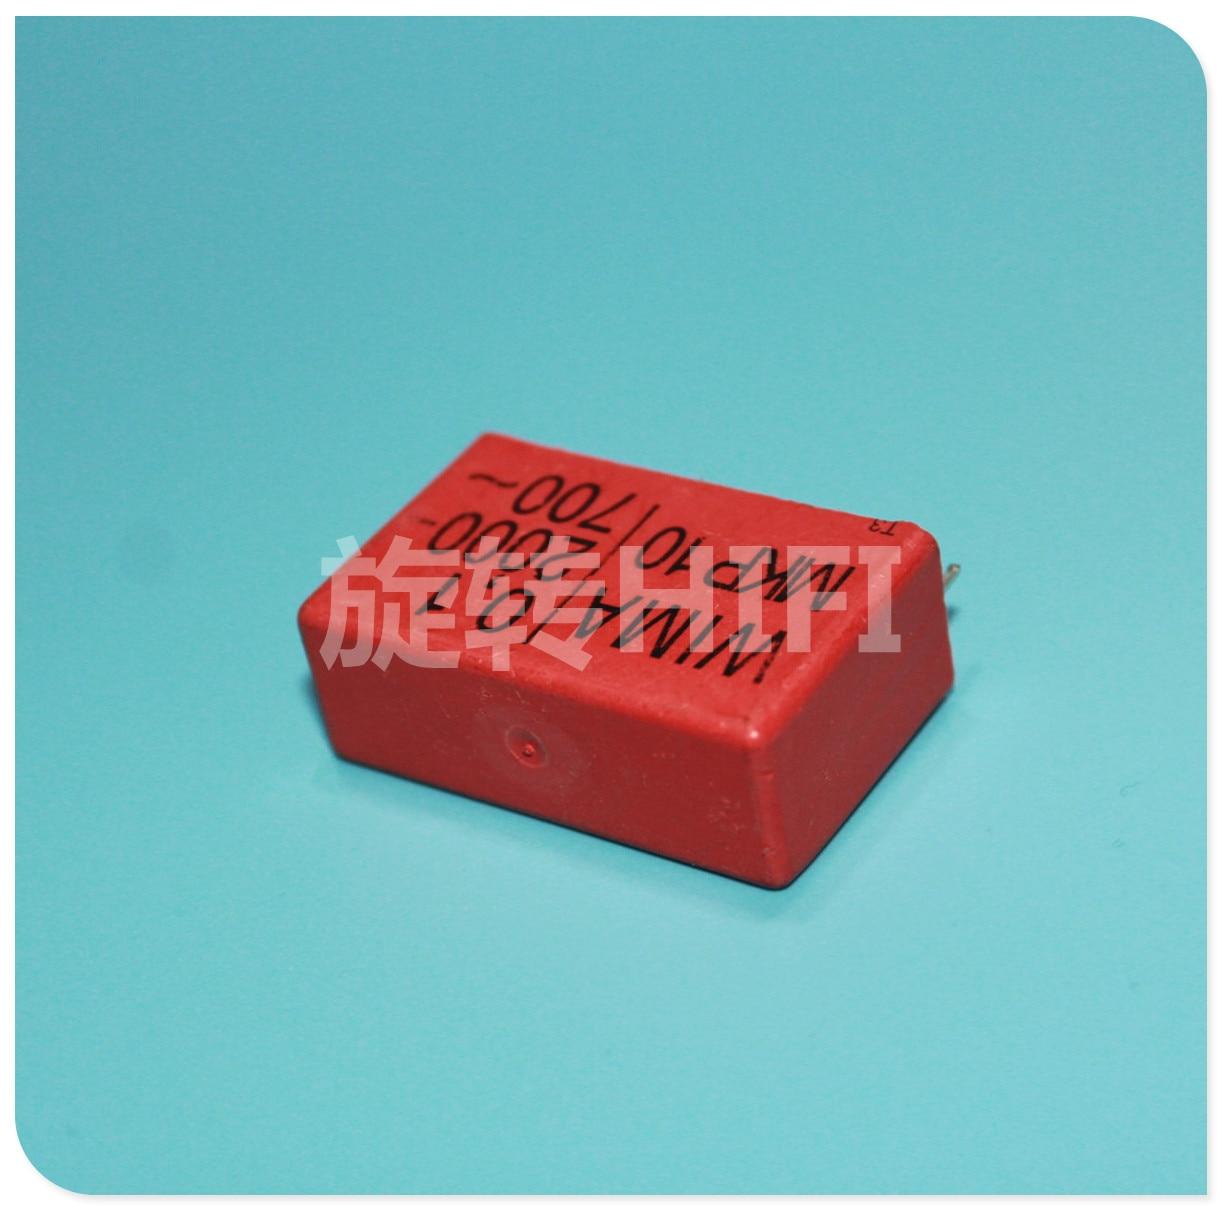 WIMA 37.5MM MKP10 MKP4 Film Audio Capacitor 100NF 150NF 330NF 470NF 680NF 1.5UF 2.2UF 2000V 1600V 1000V 630V 0.1UF 0.15UF 0.68UF